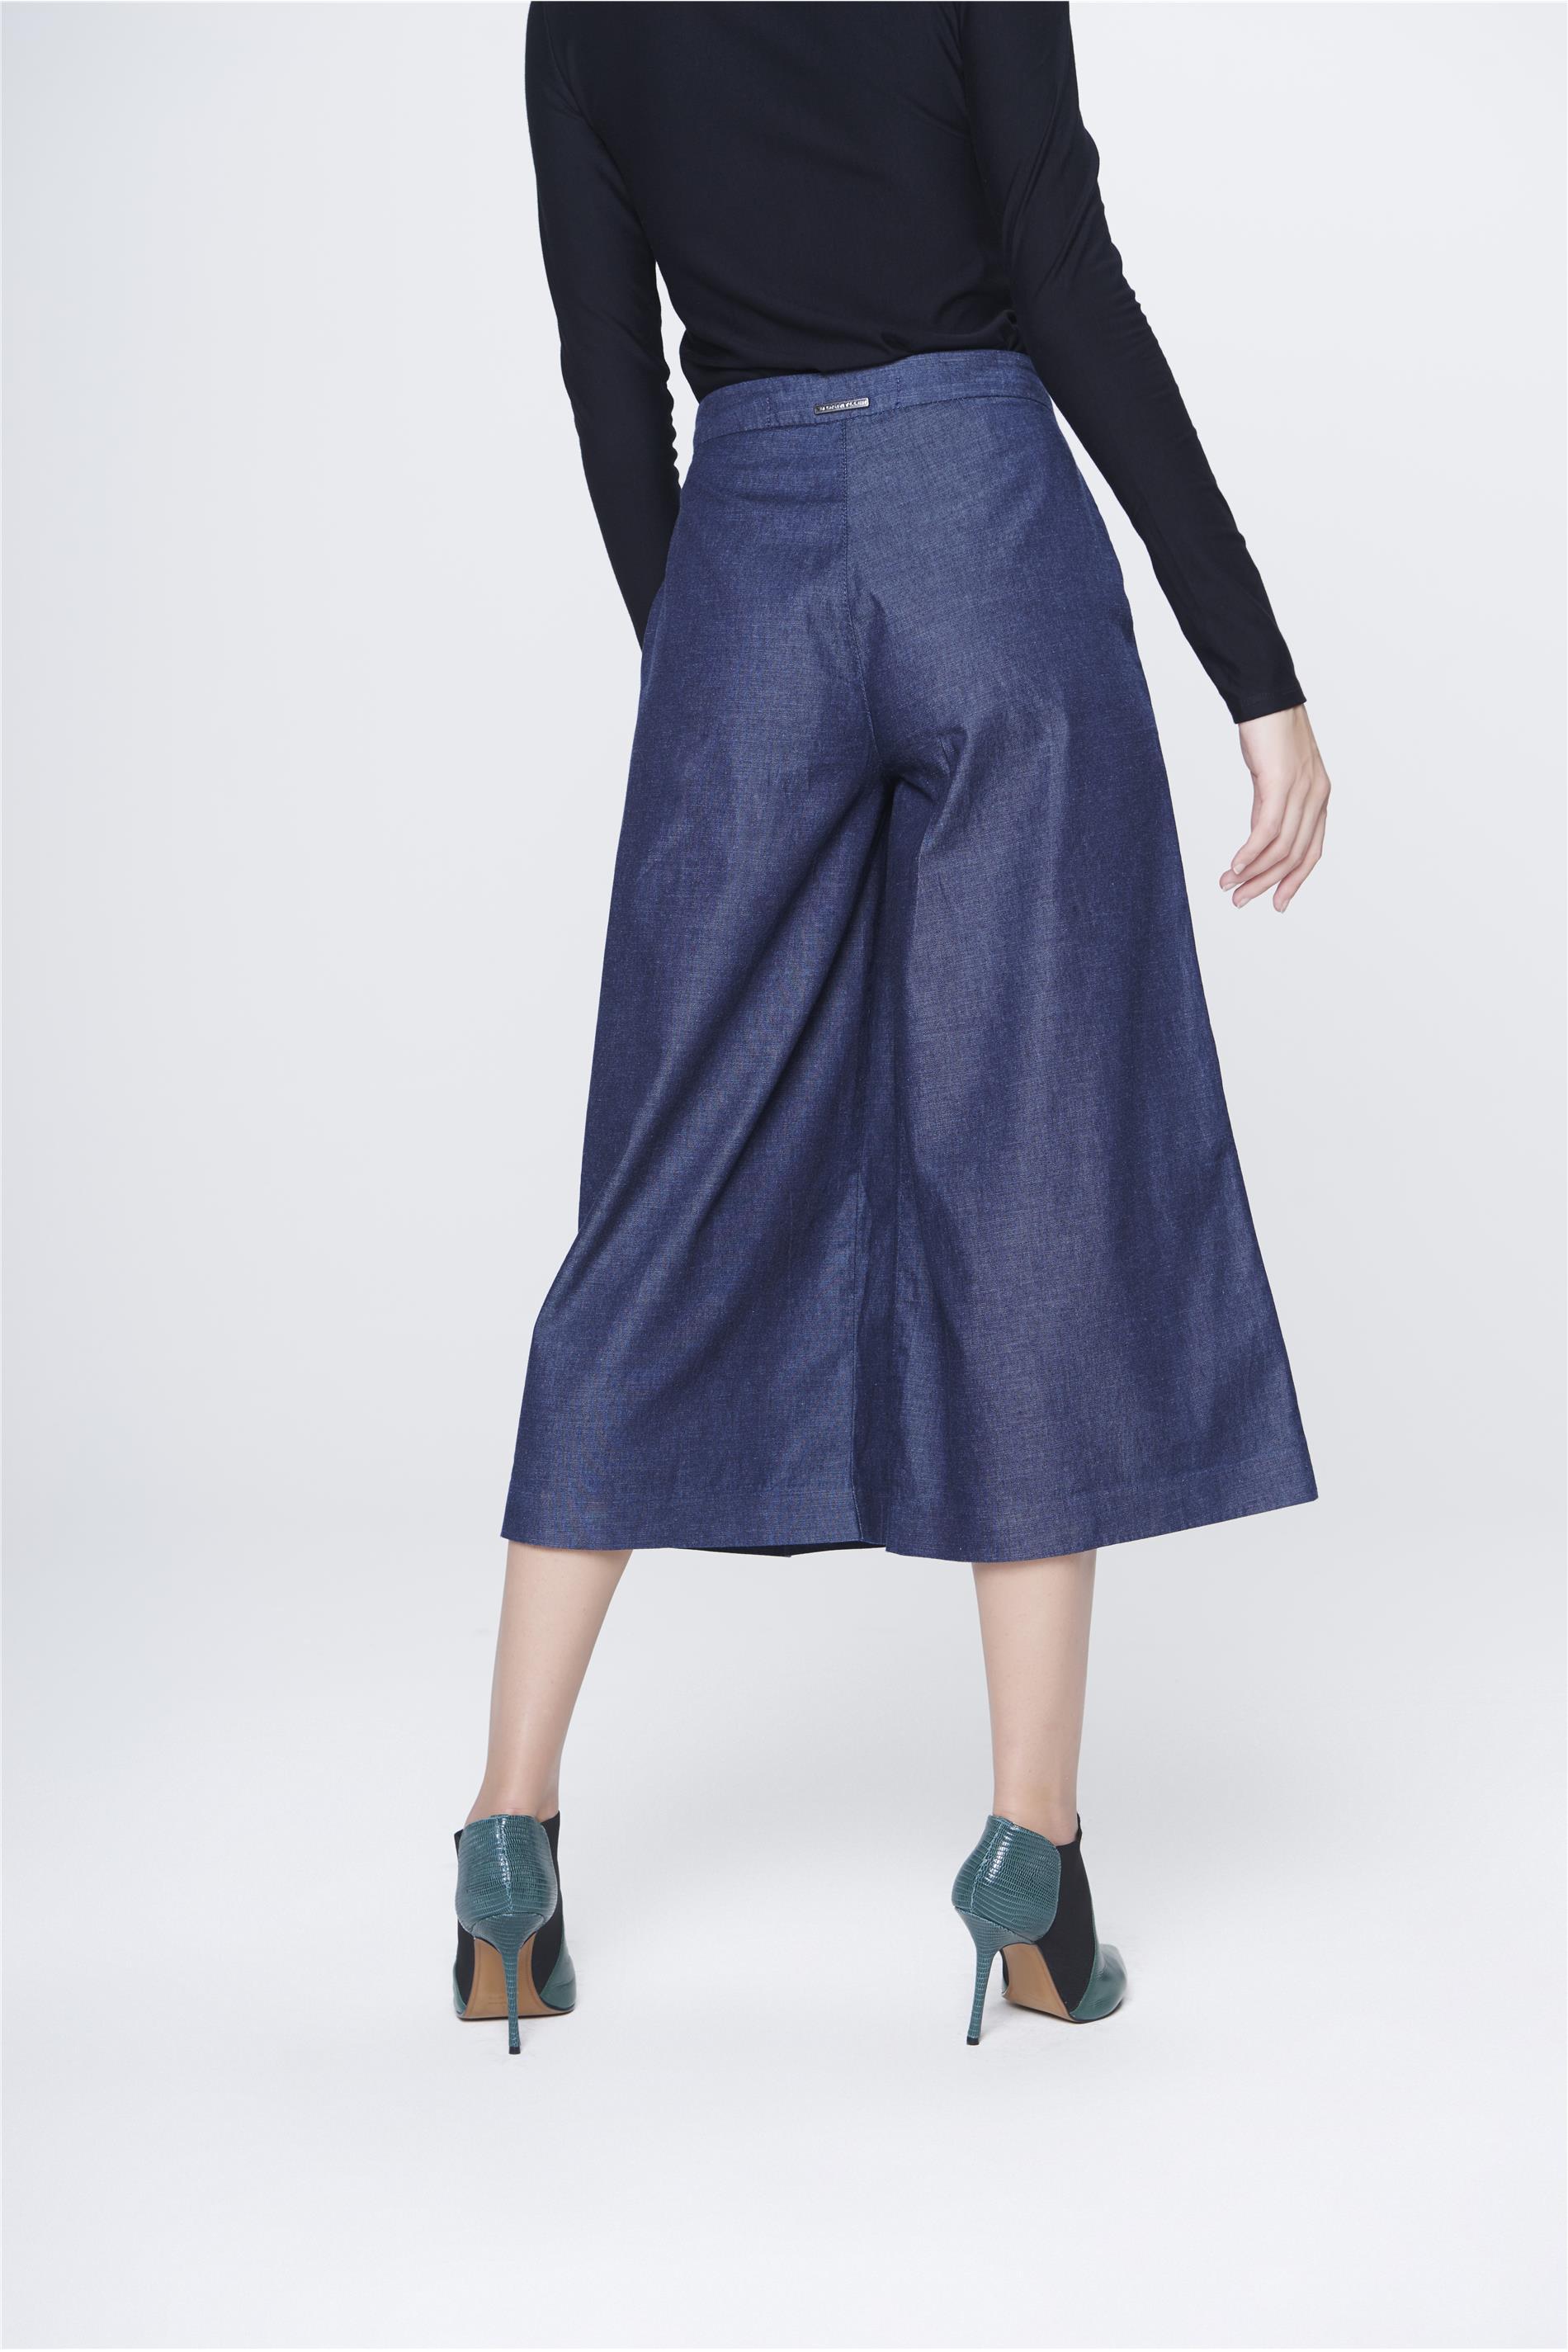 a5bdad5a0 Calça Jeans Pantacourt Feminina - Damyller